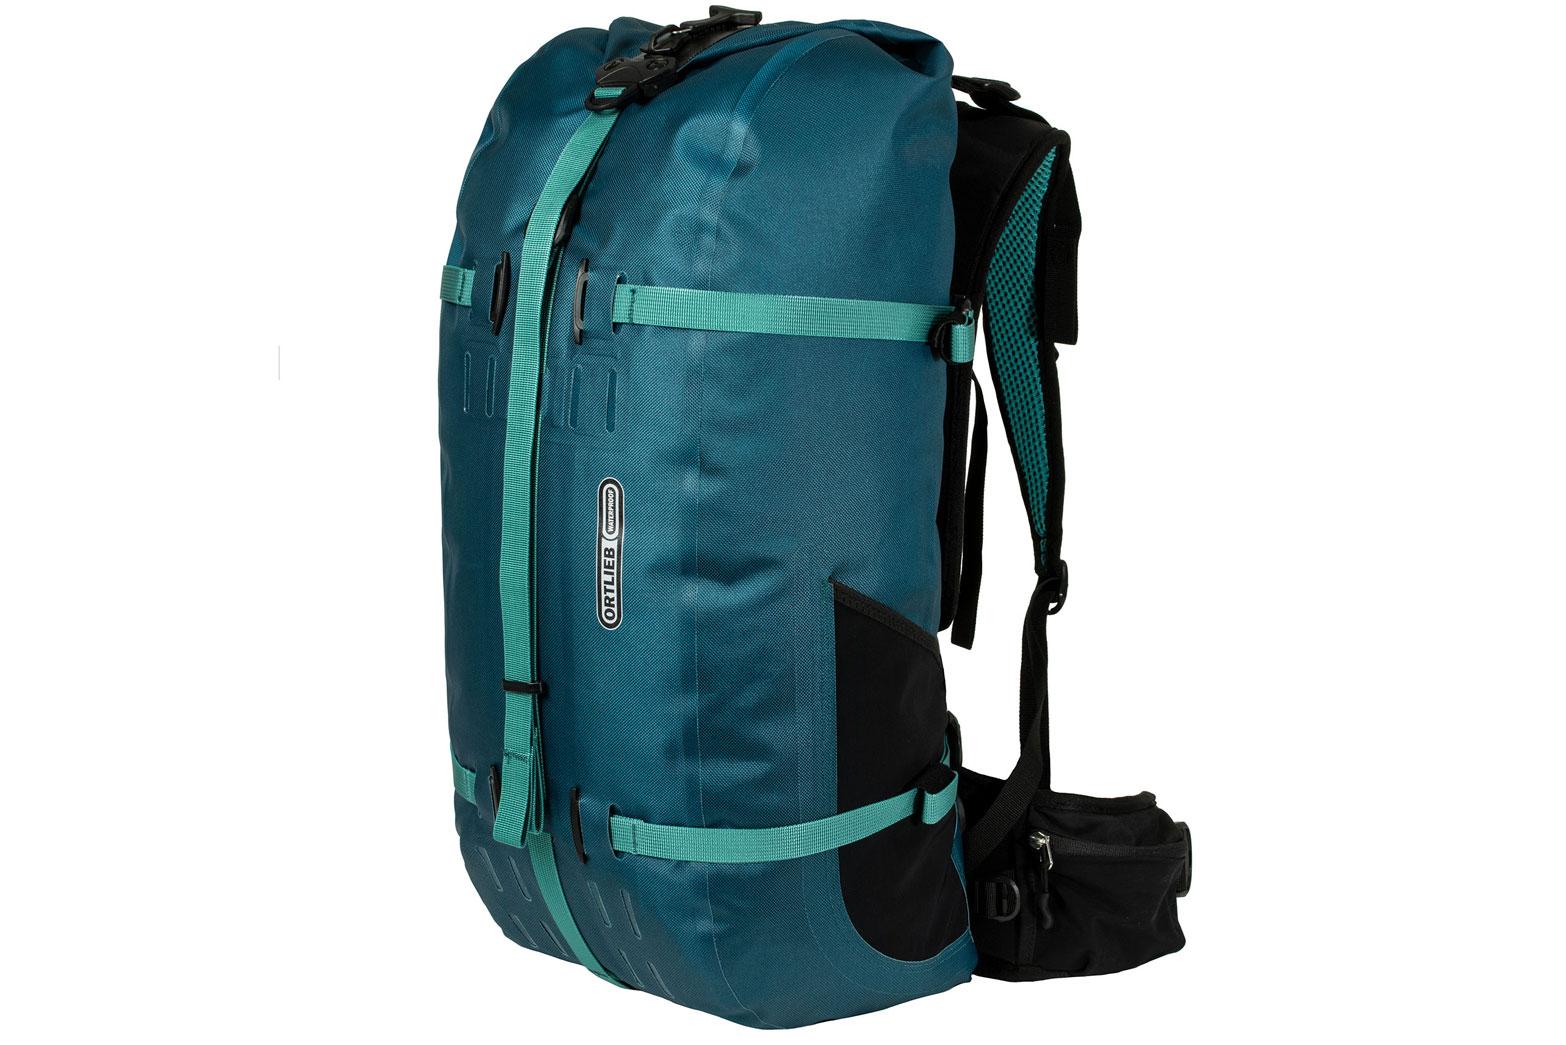 Ortlieb Atrack ST travel backpack